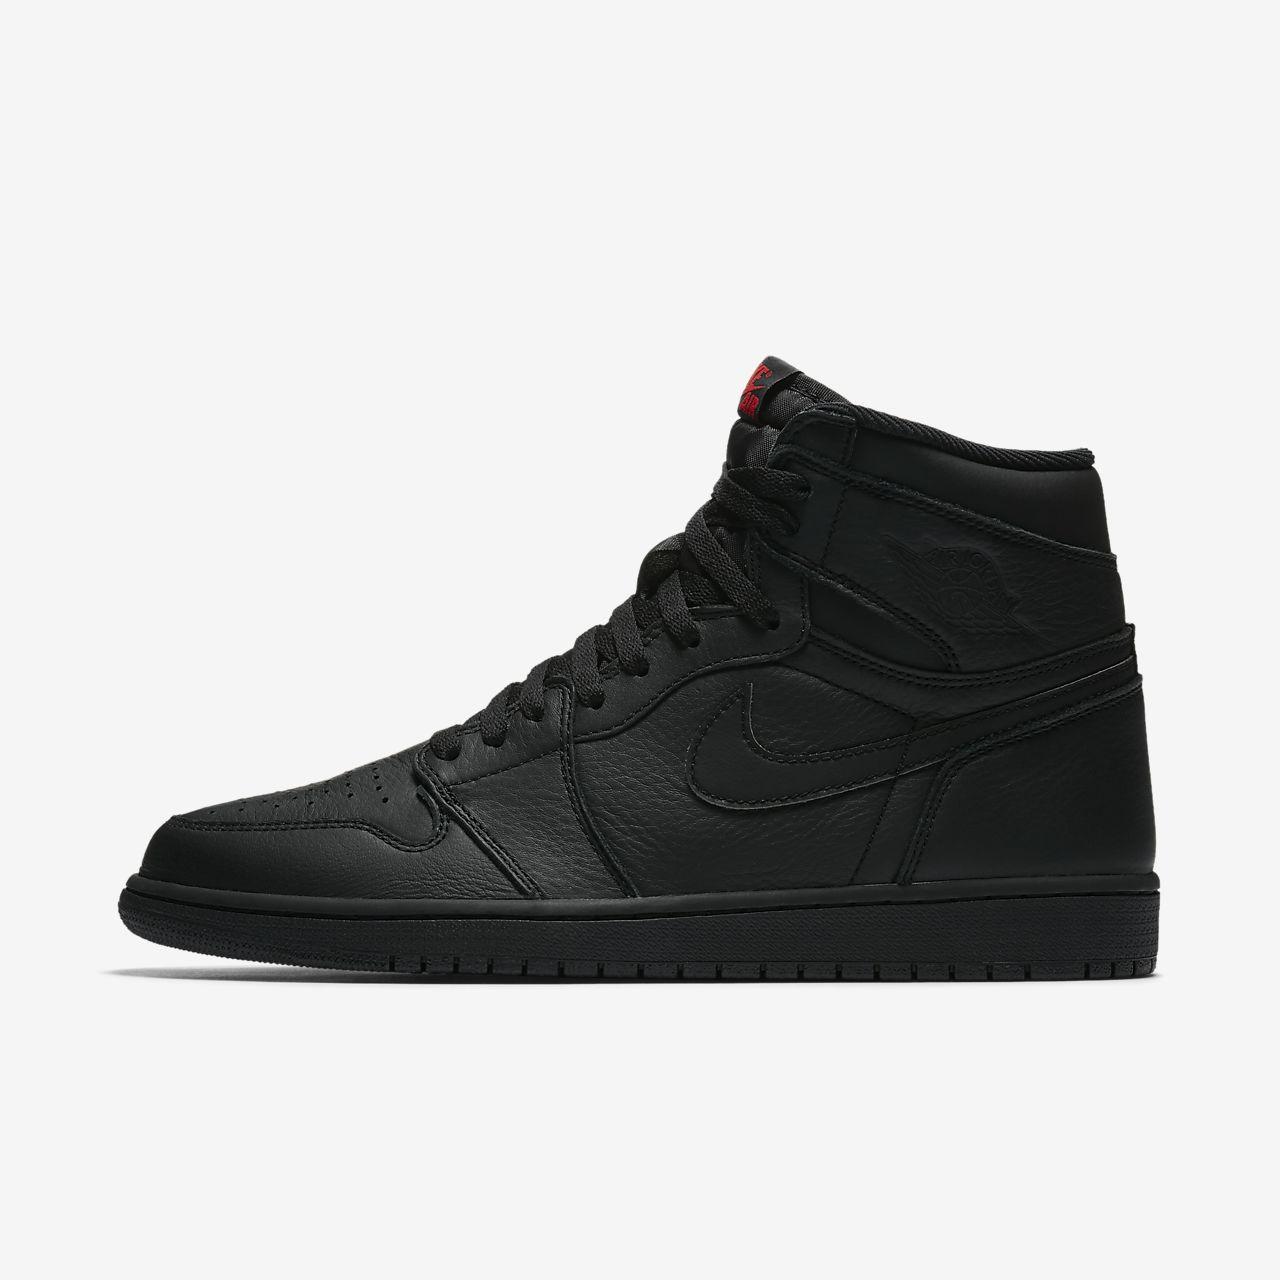 Nike Air Jordan Rétro Noir